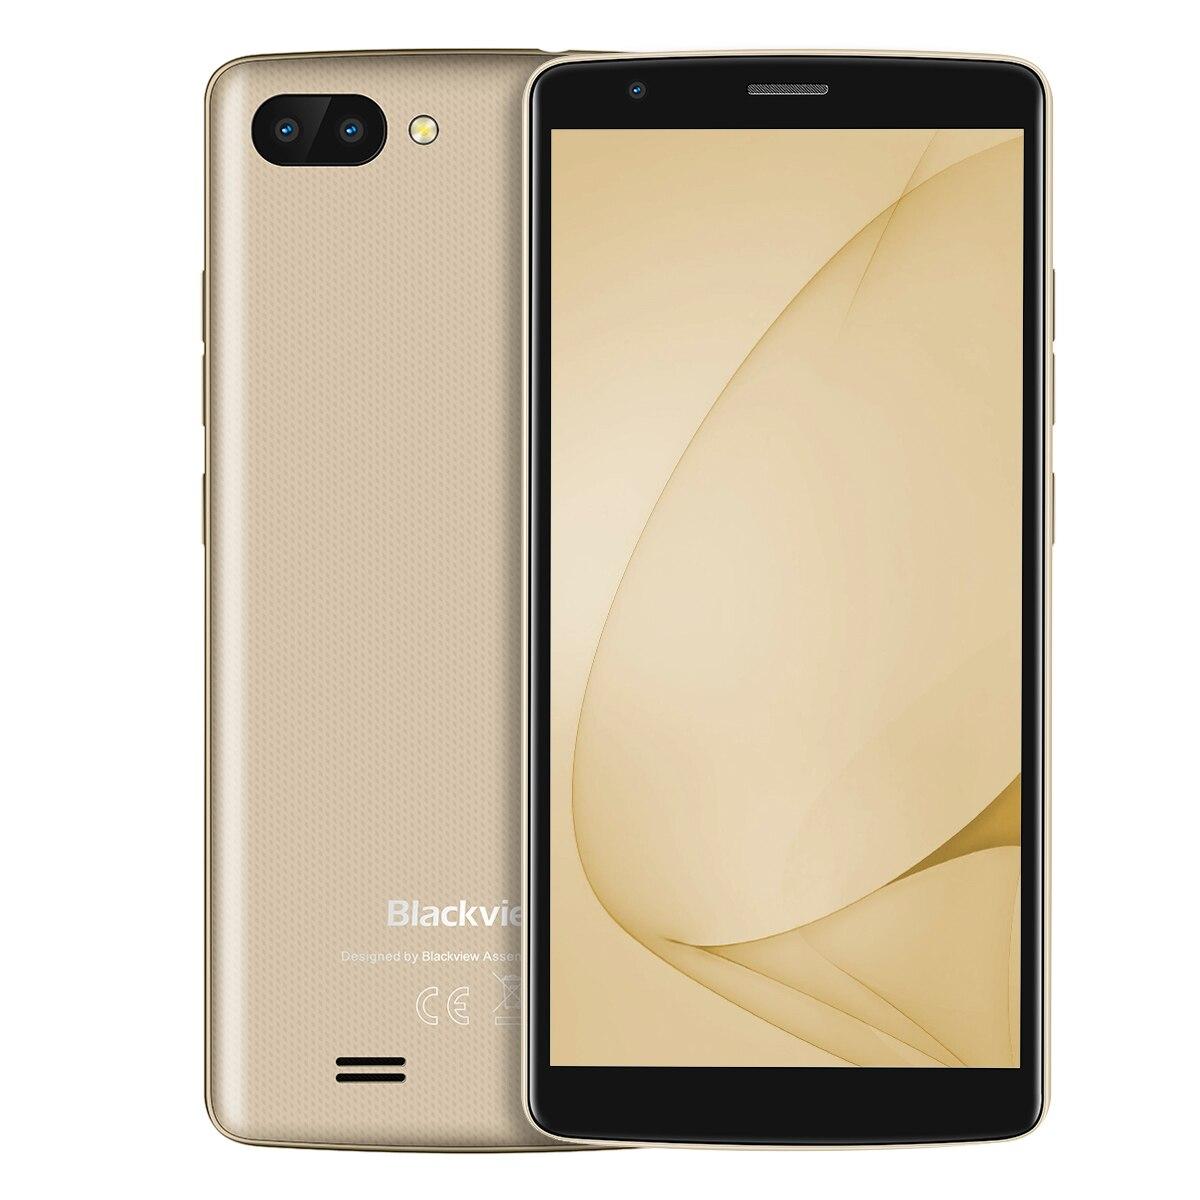 "Blackview Original A20 Smartphone 5.5"" 1GB + 8GB 2800MAH Quad-Core Android GO 18:9 Screen 3G Dual SIM Fashion Slim Mobile Phone"